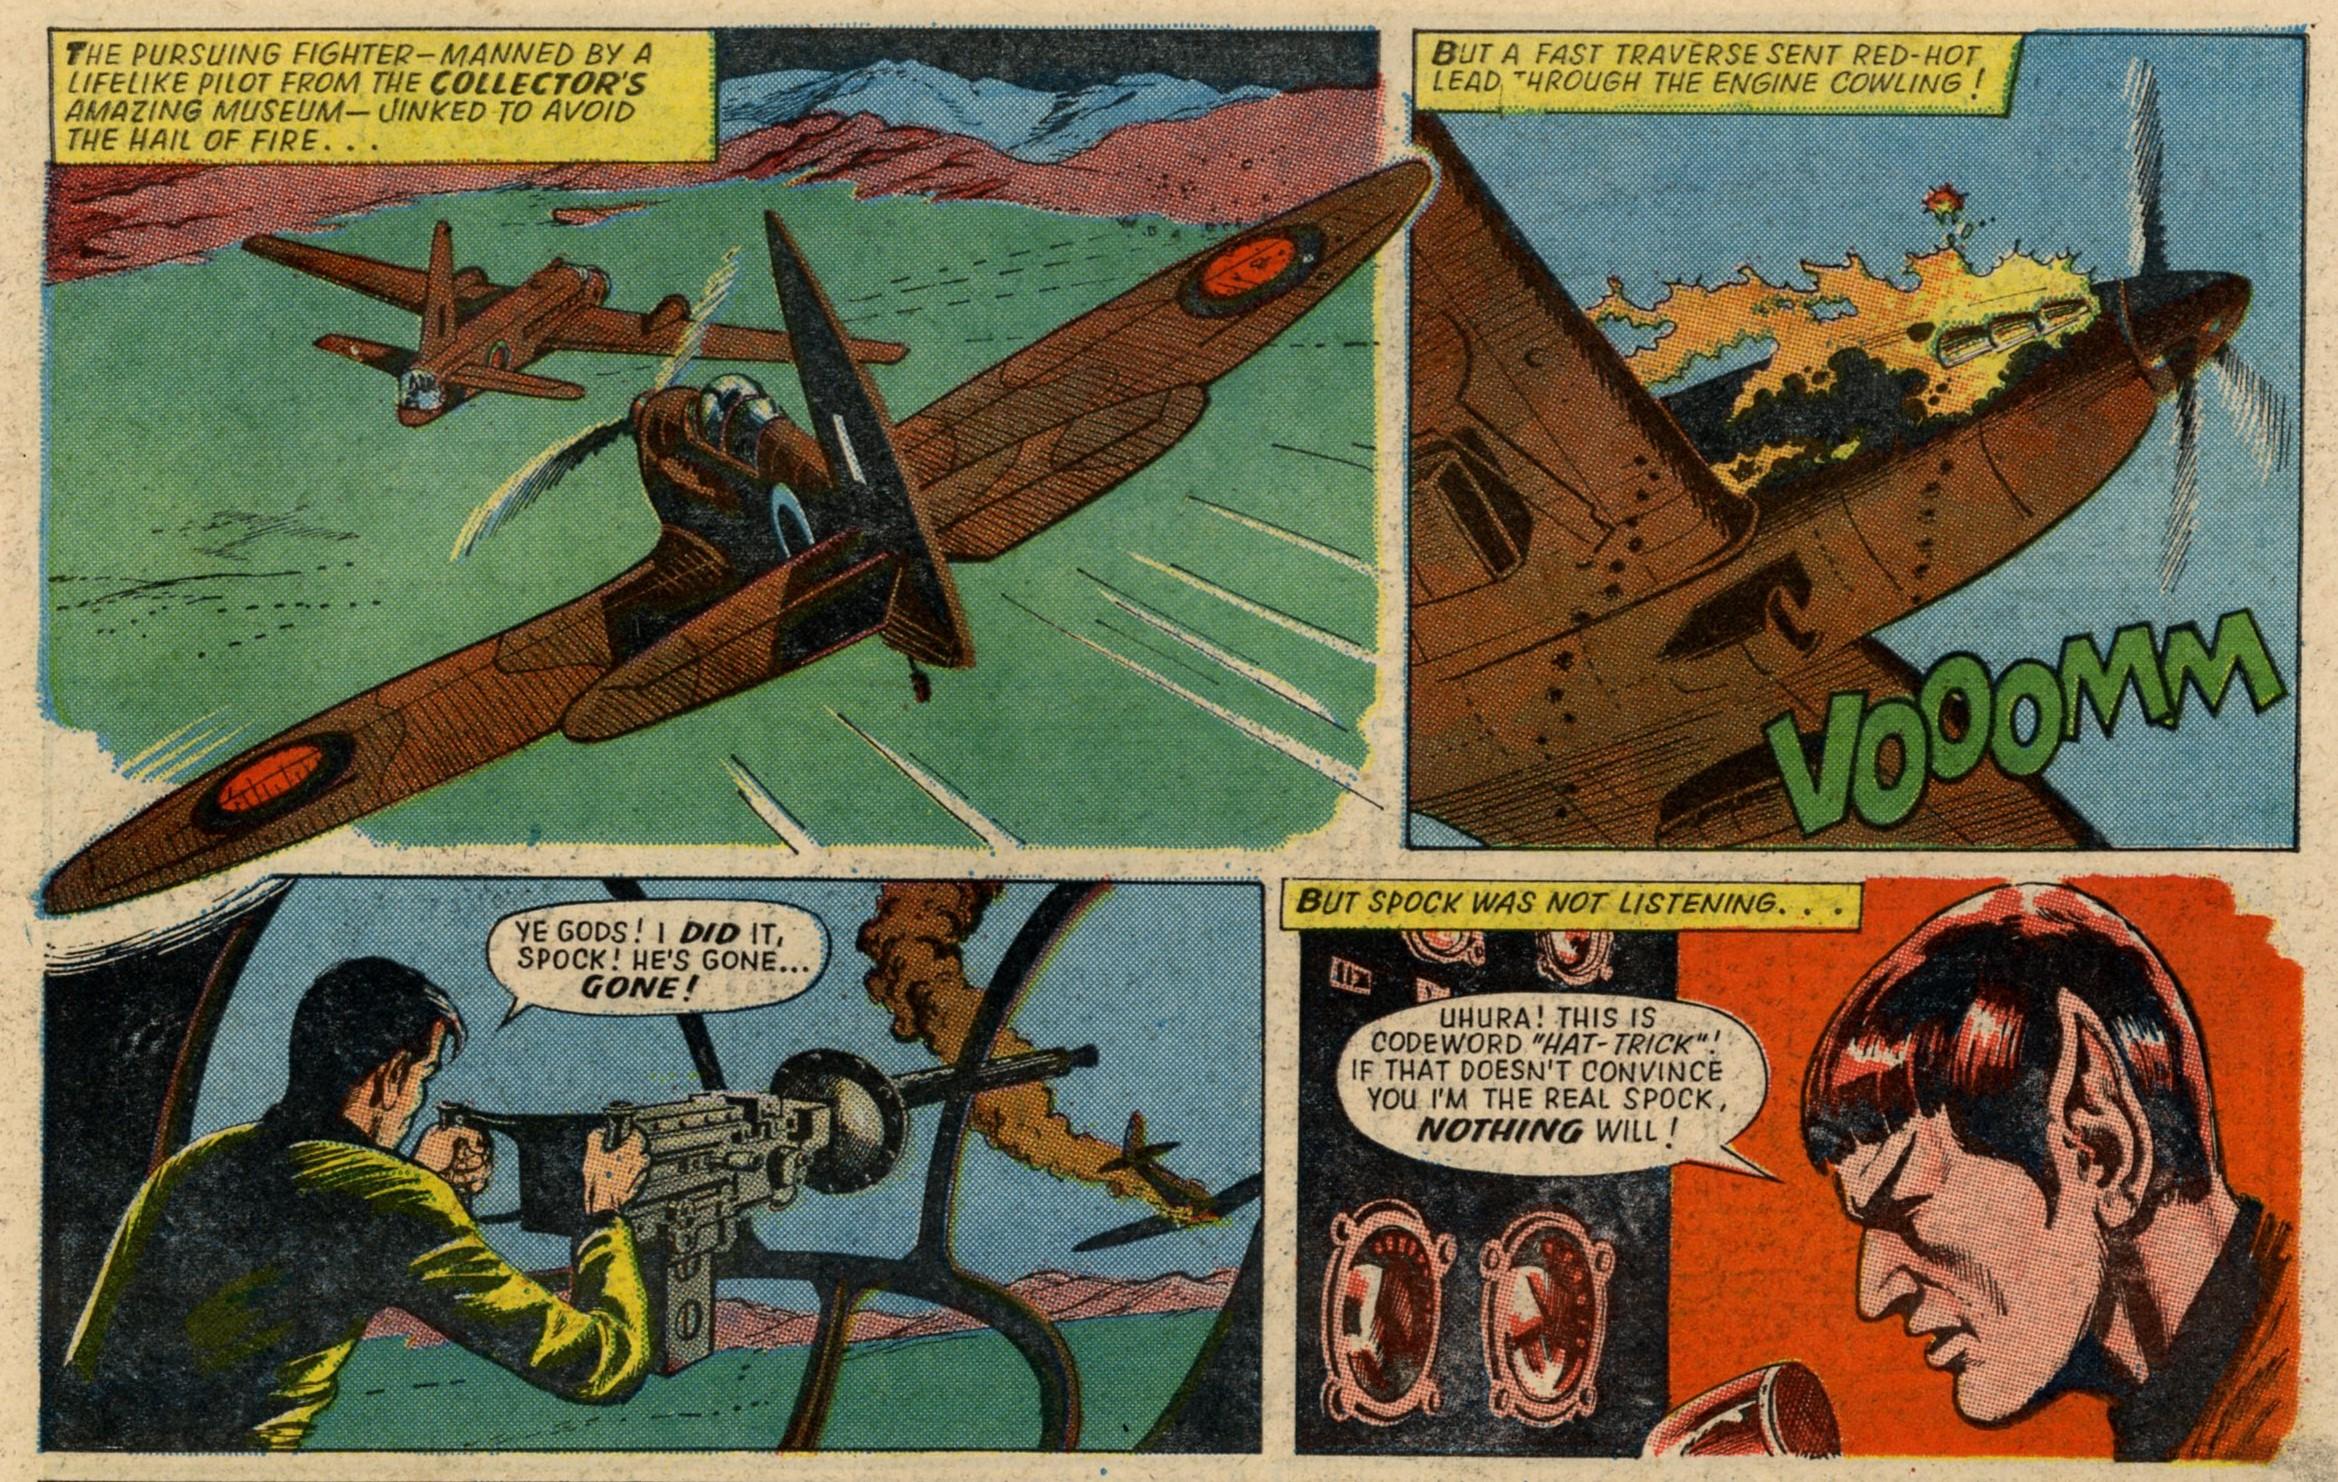 Star Trek: Angus Allan (writer), John Stokes (artist)